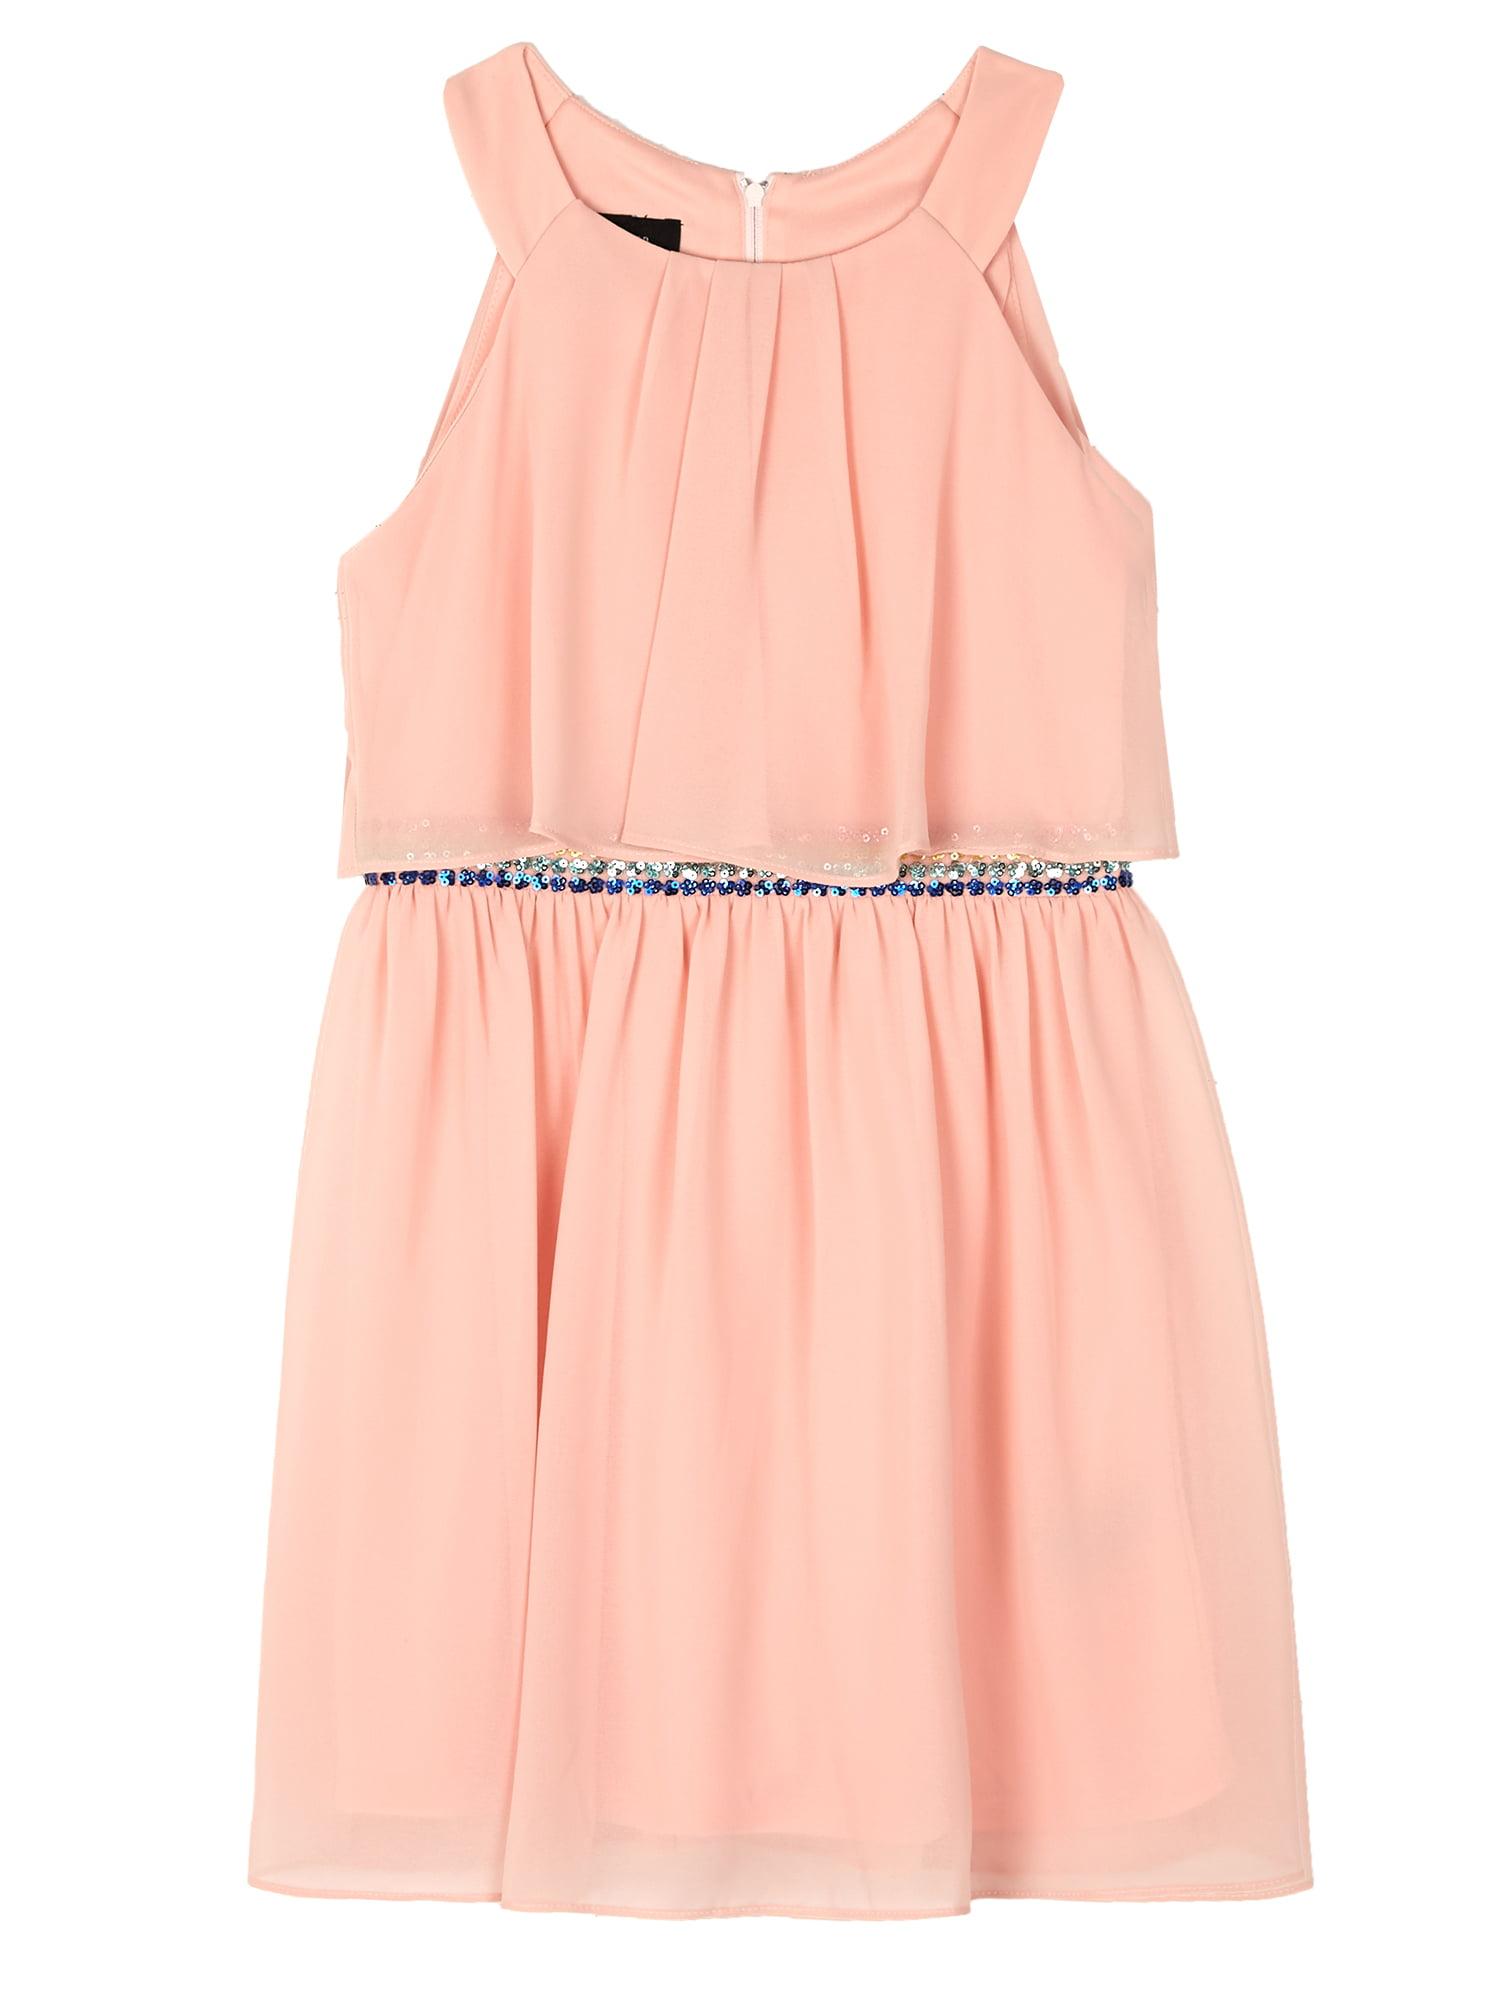 Popover Dress with Applique Waist (Big Girls)